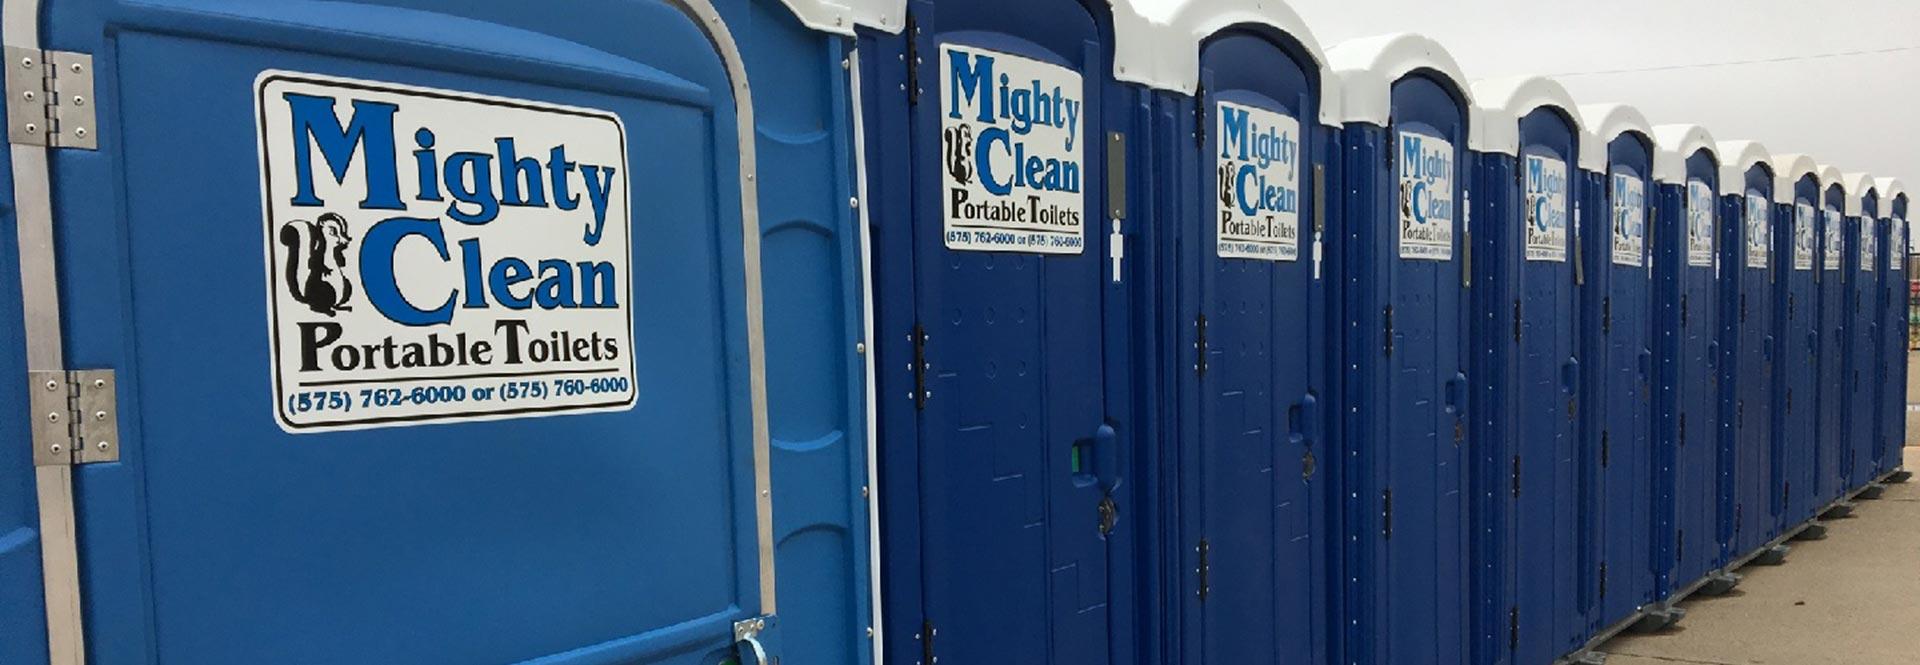 Porta Potty, Portable Toilet & Septic Company in Clovis, NM